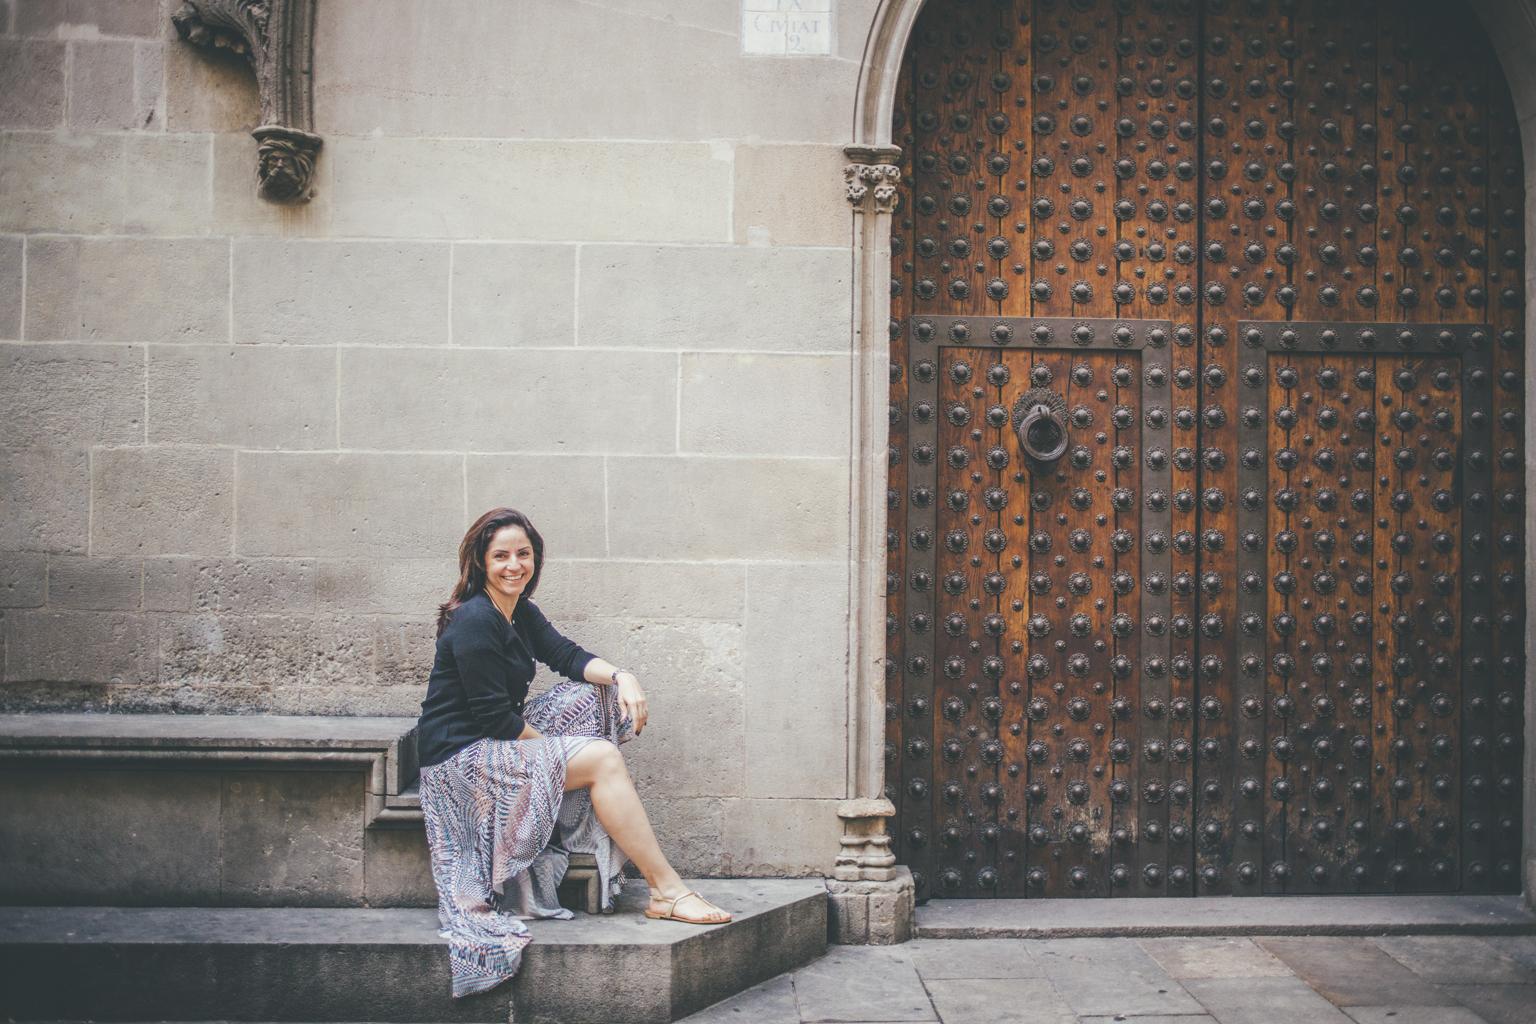 Fotógrafo de Pareja Barcelona :: Barrio Gótico, Born y Parque de la Ciutadella :: Best Barcelona photographer :: Fotografía romántica :: Fotógrafo natural en Barcelona :: Fotografía de pareja :: Preboda :: Love Session :: Romantic photographer